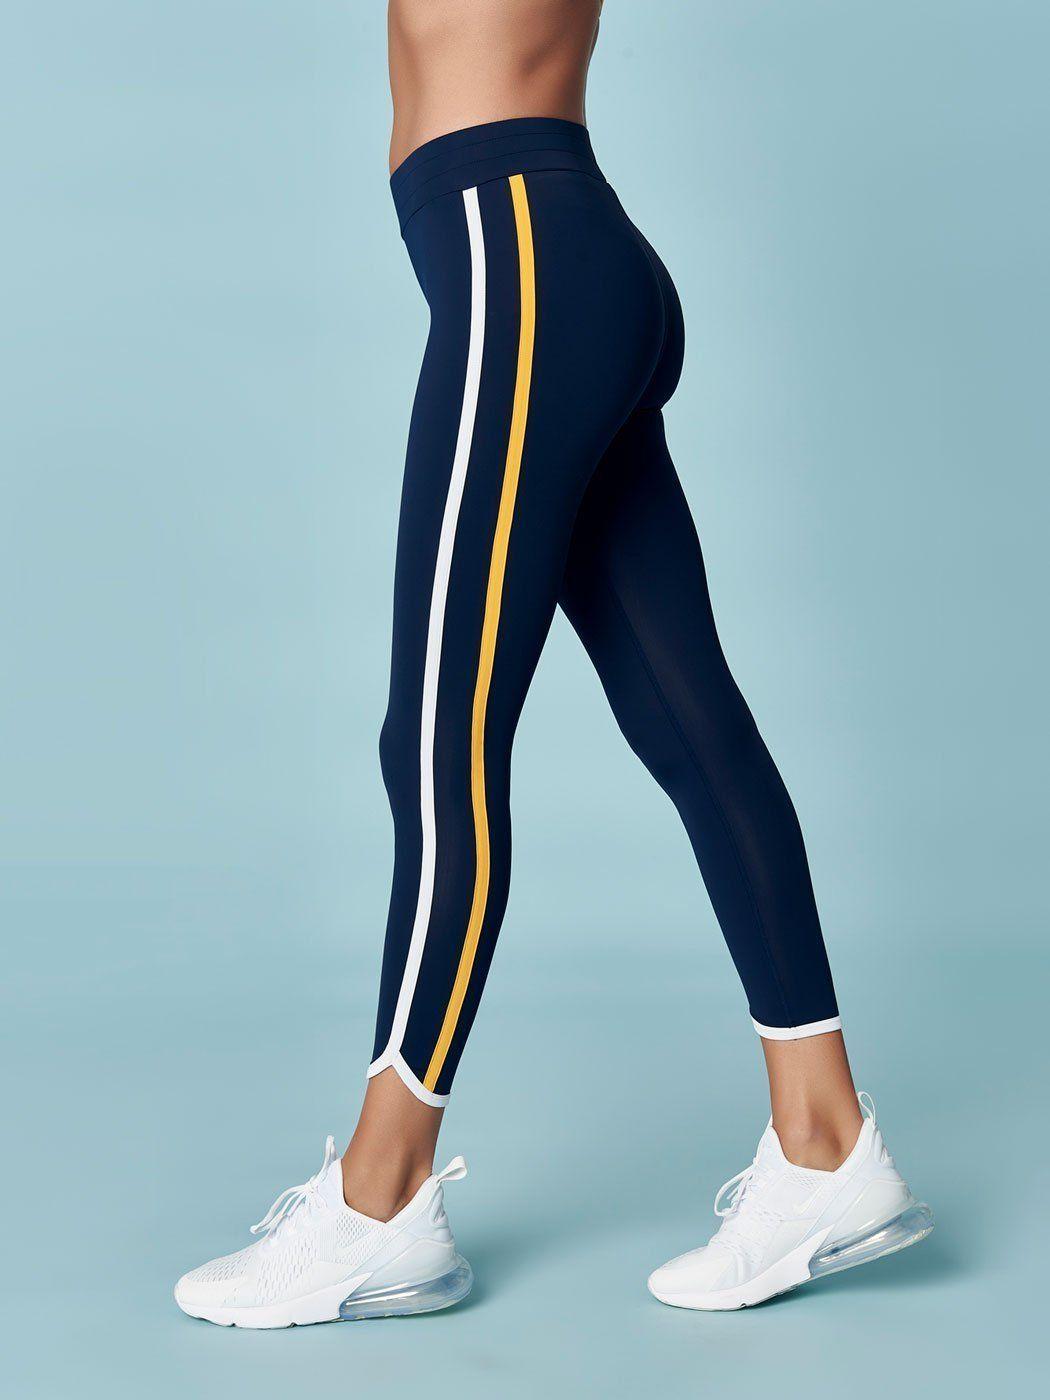 Dream Team Plunge Bra in 2020 Women's fashion leggings